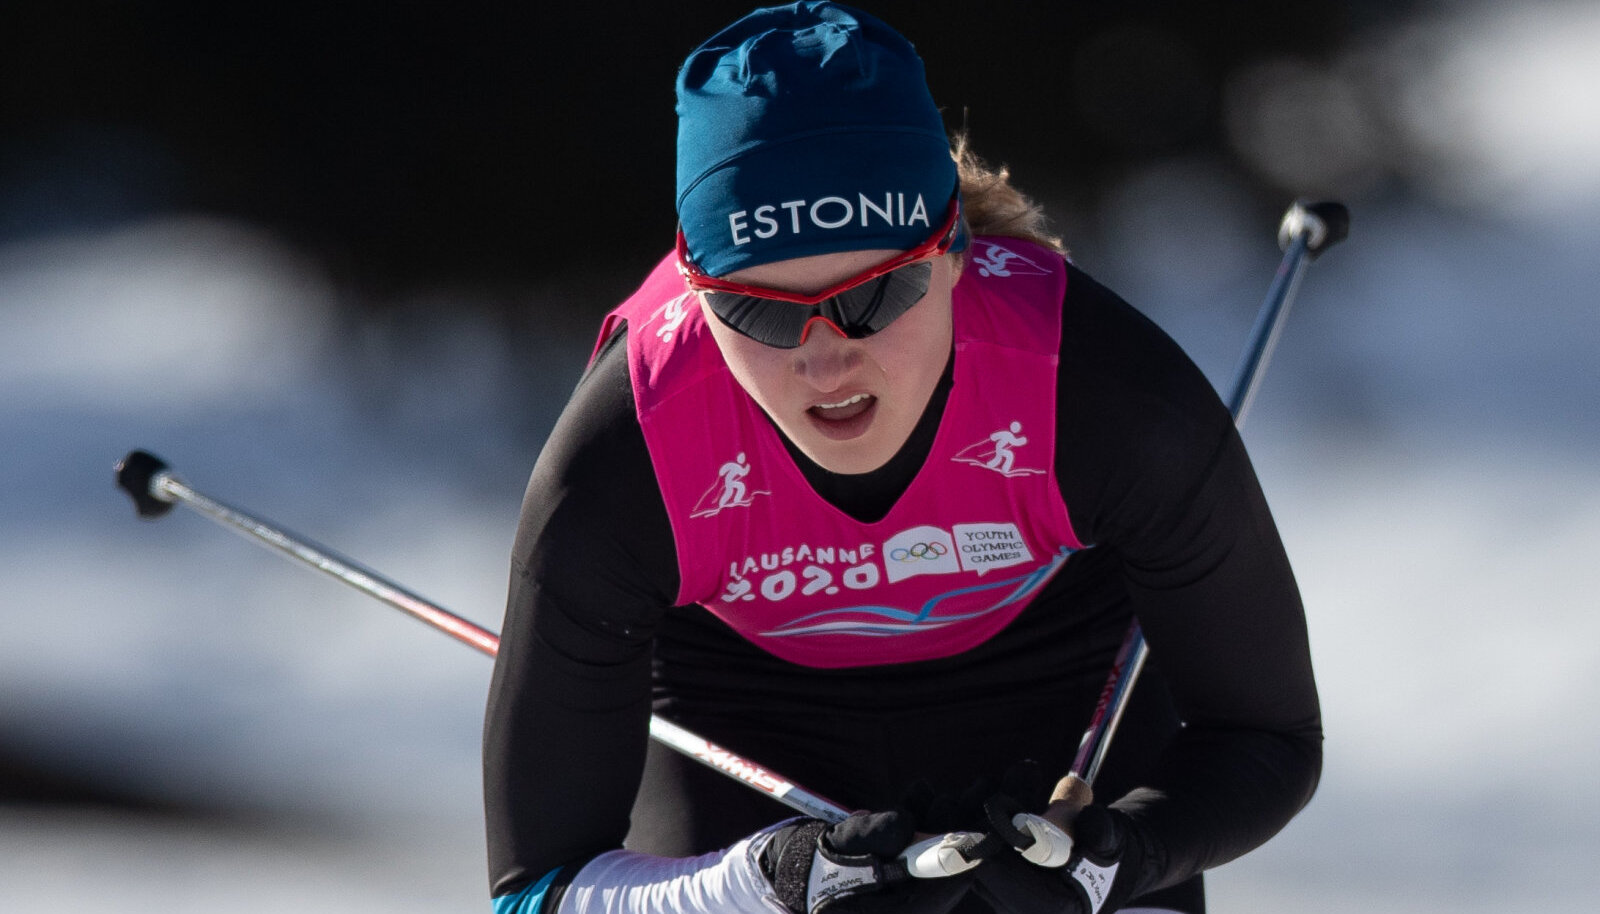 Johanna Udras